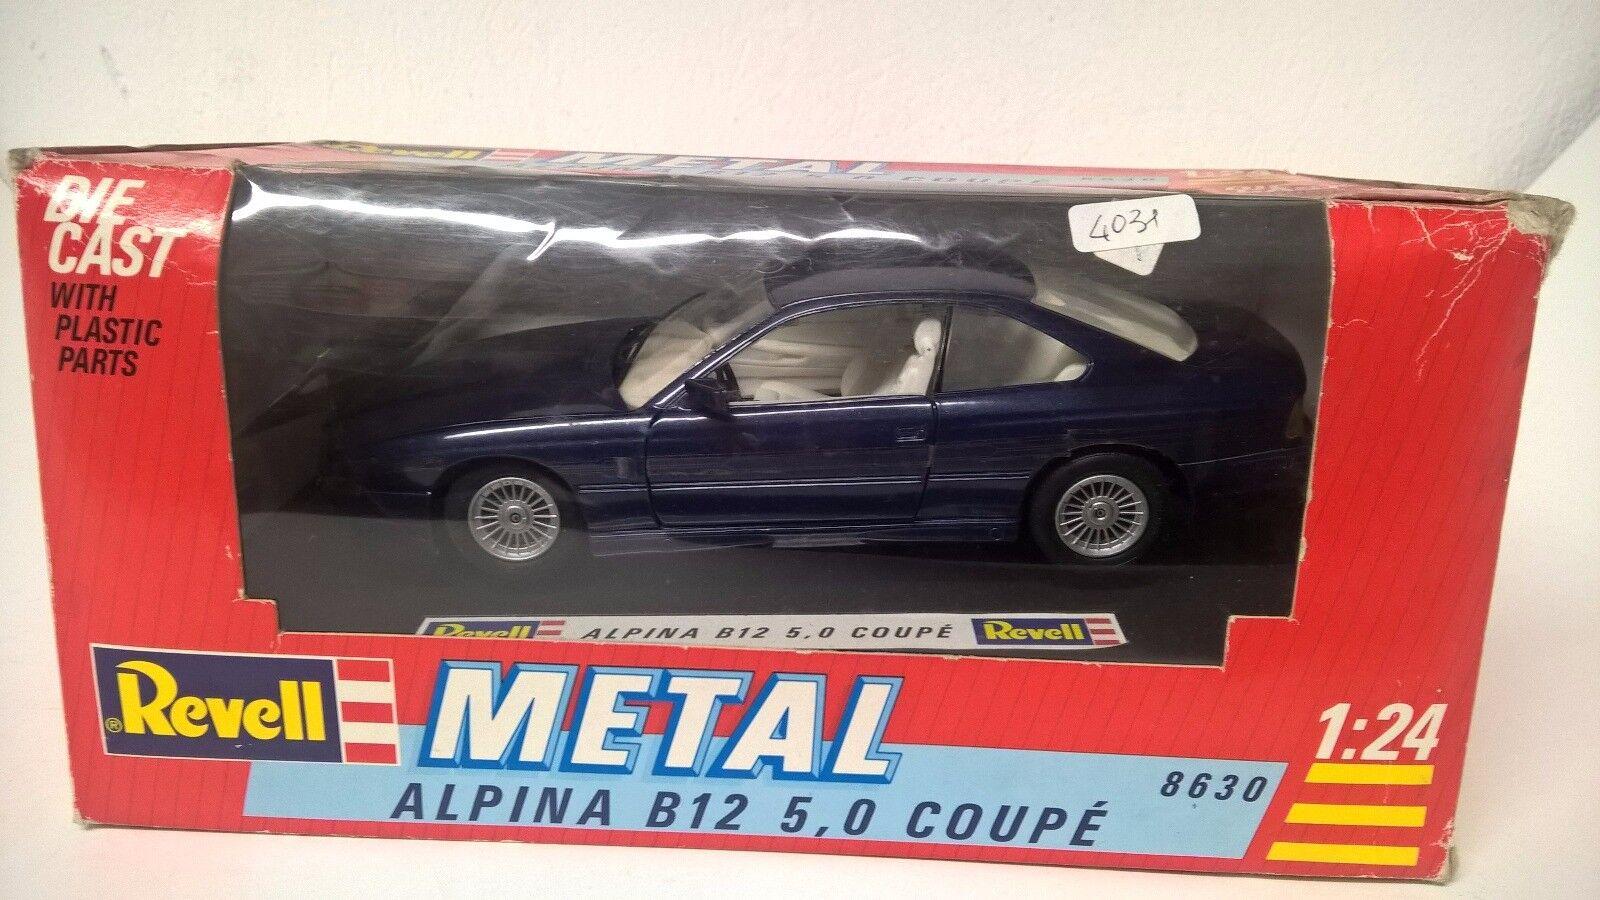 REVELL 1/24 1/25 BMW 850 ALPINA B12 5.0 BOX RARA